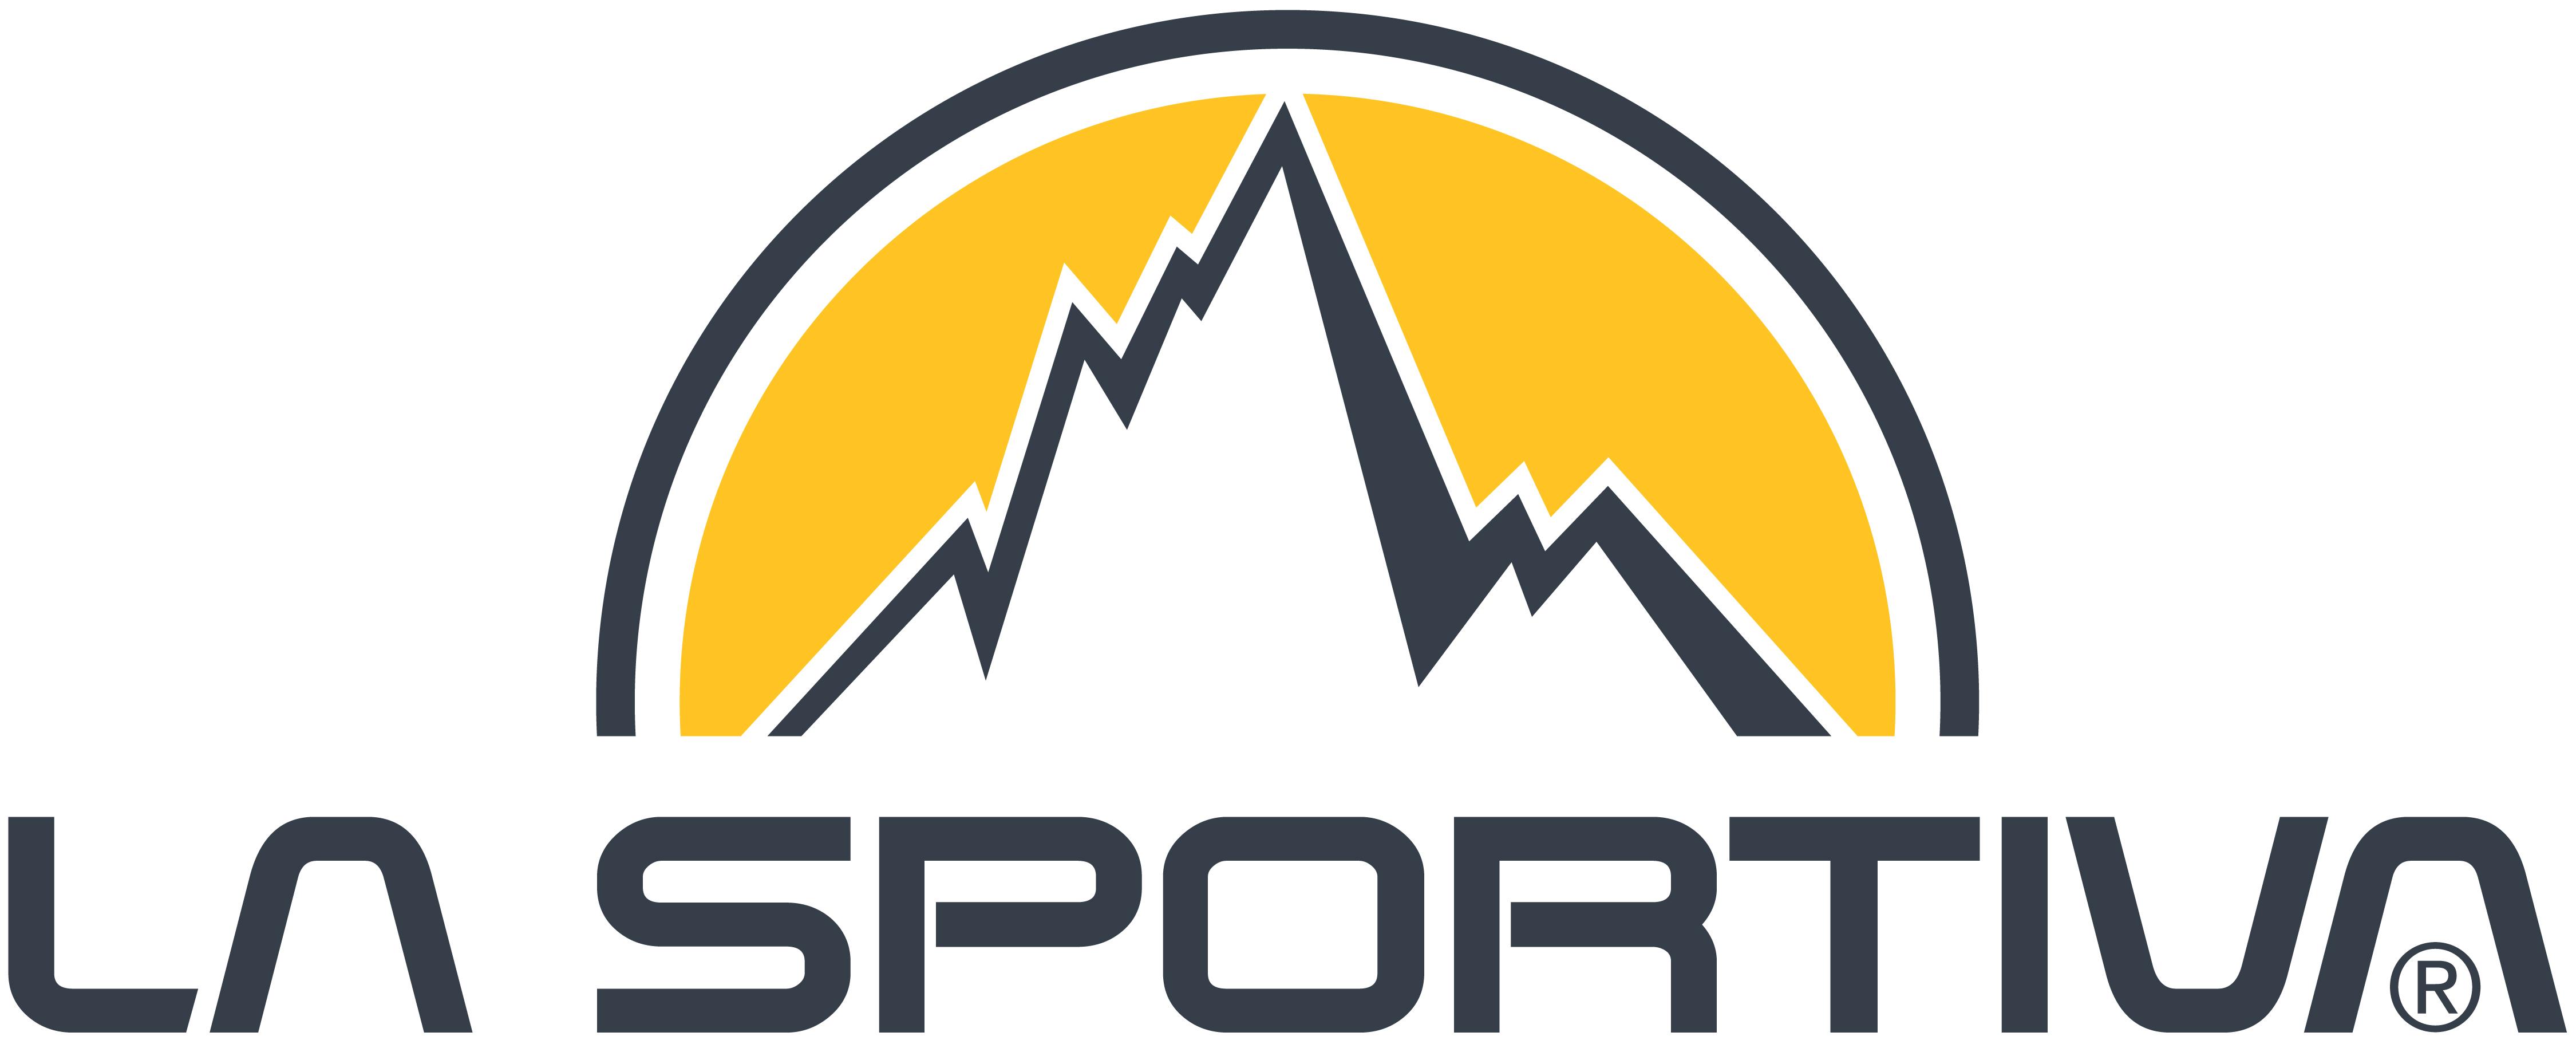 lasportiva_logo-1